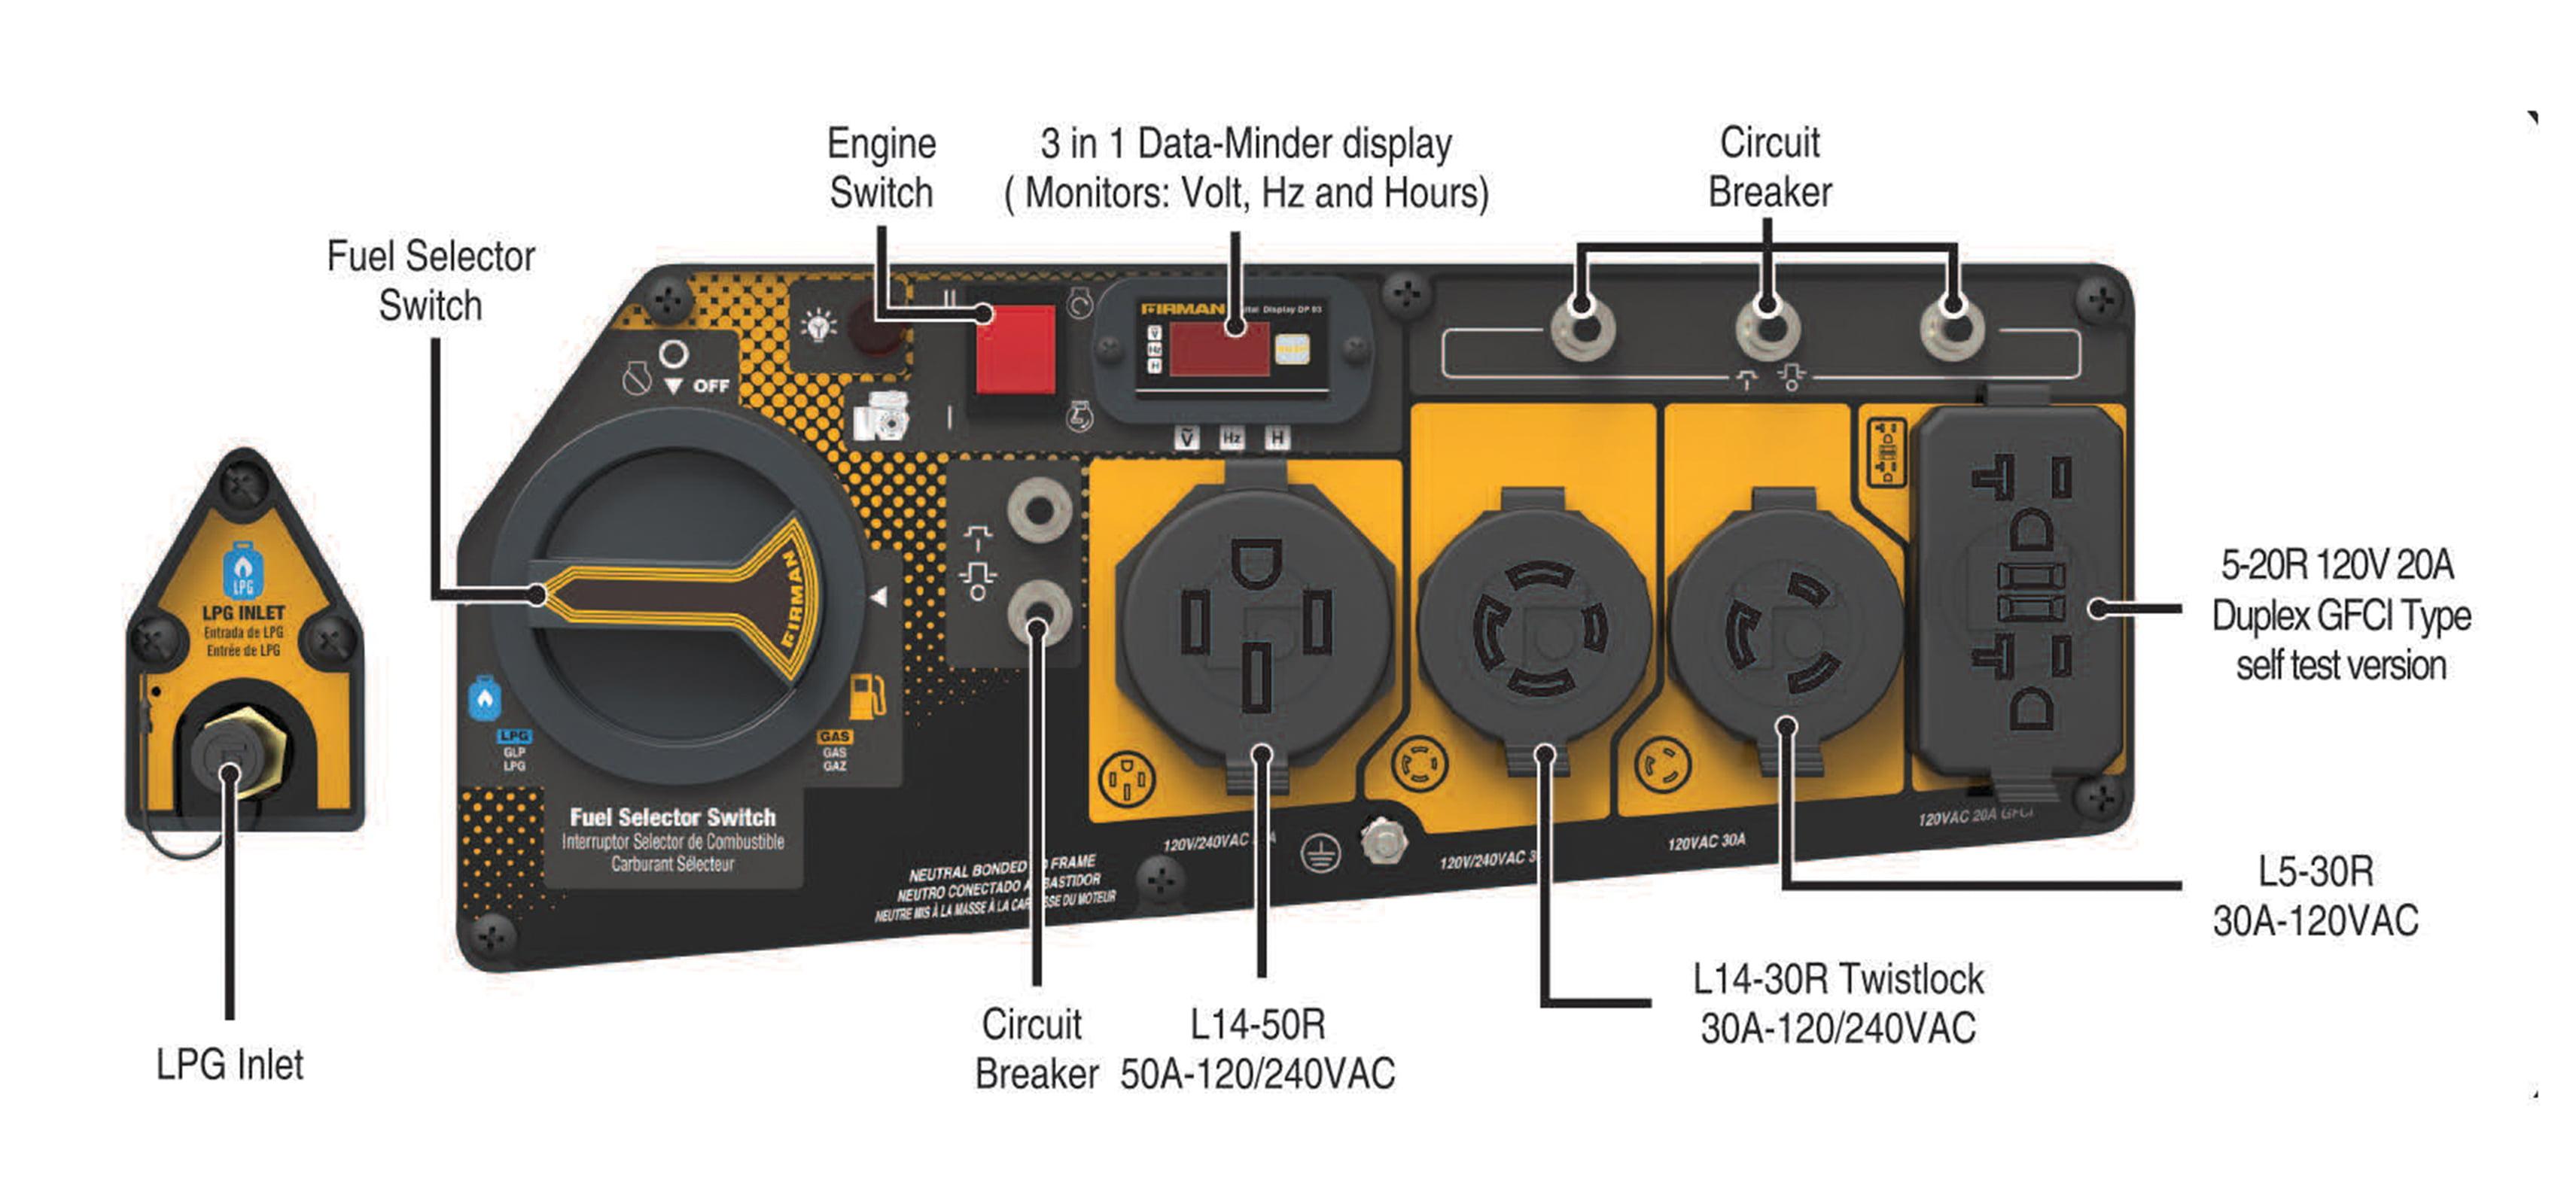 Firman H08051 10000 8000 Watt Dual Fuel Electric Start Generator Pro Comp Pc Wiring Diagram Carb